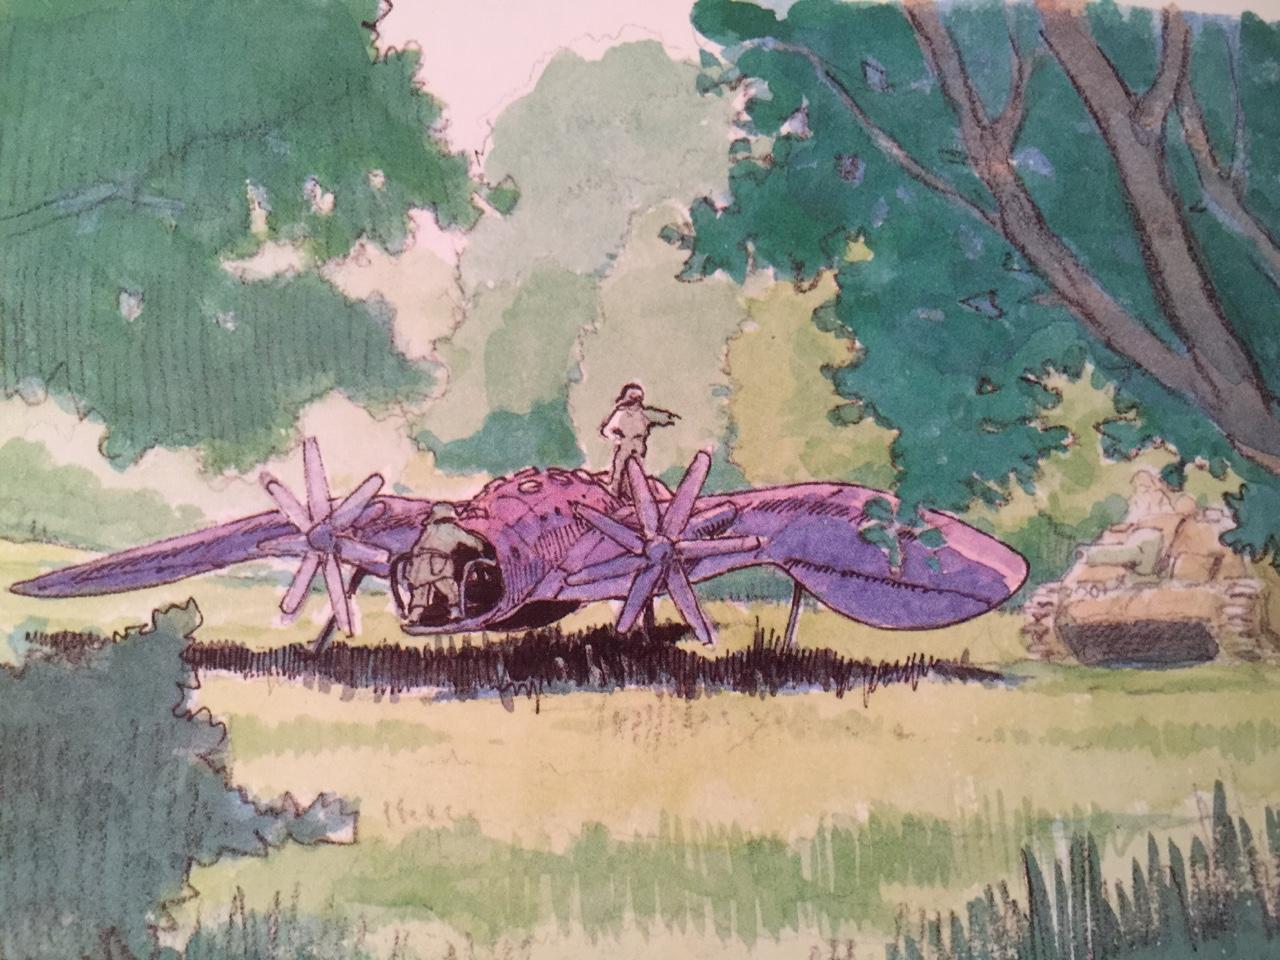 Hayao-Miyazaki-The-Art-Of-Nausica-Of-The-Valley-Of-The-Wind-Watercolor-Impressions-nausicaa-of-the-valley-of-the-wind-39381877-1280-960.jpg